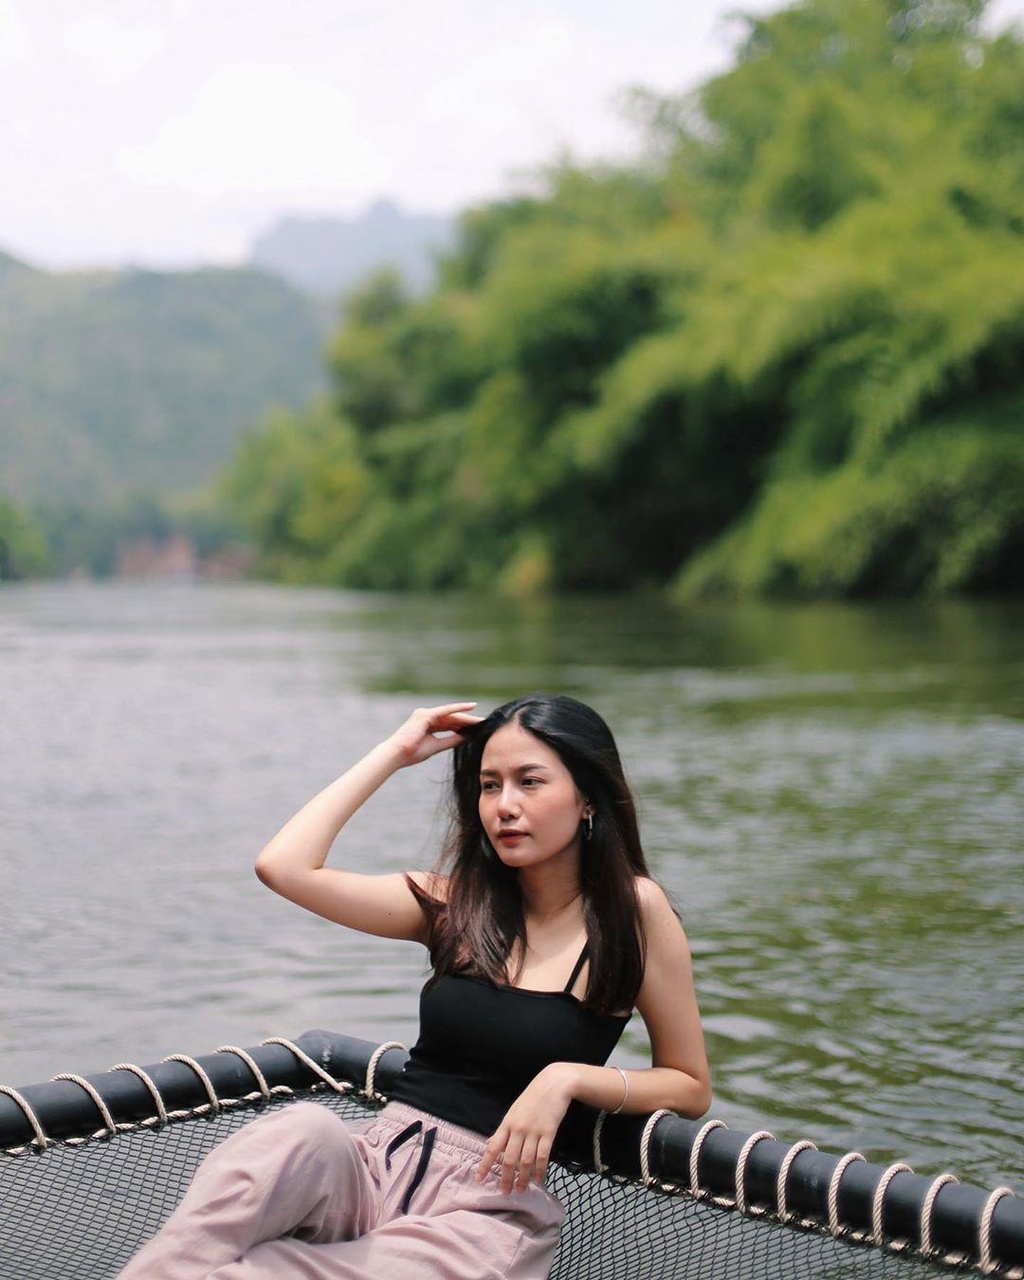 Chan Bangkok, ghe tham vung dat xanh muot tuyet dep gan ben hinh anh 16